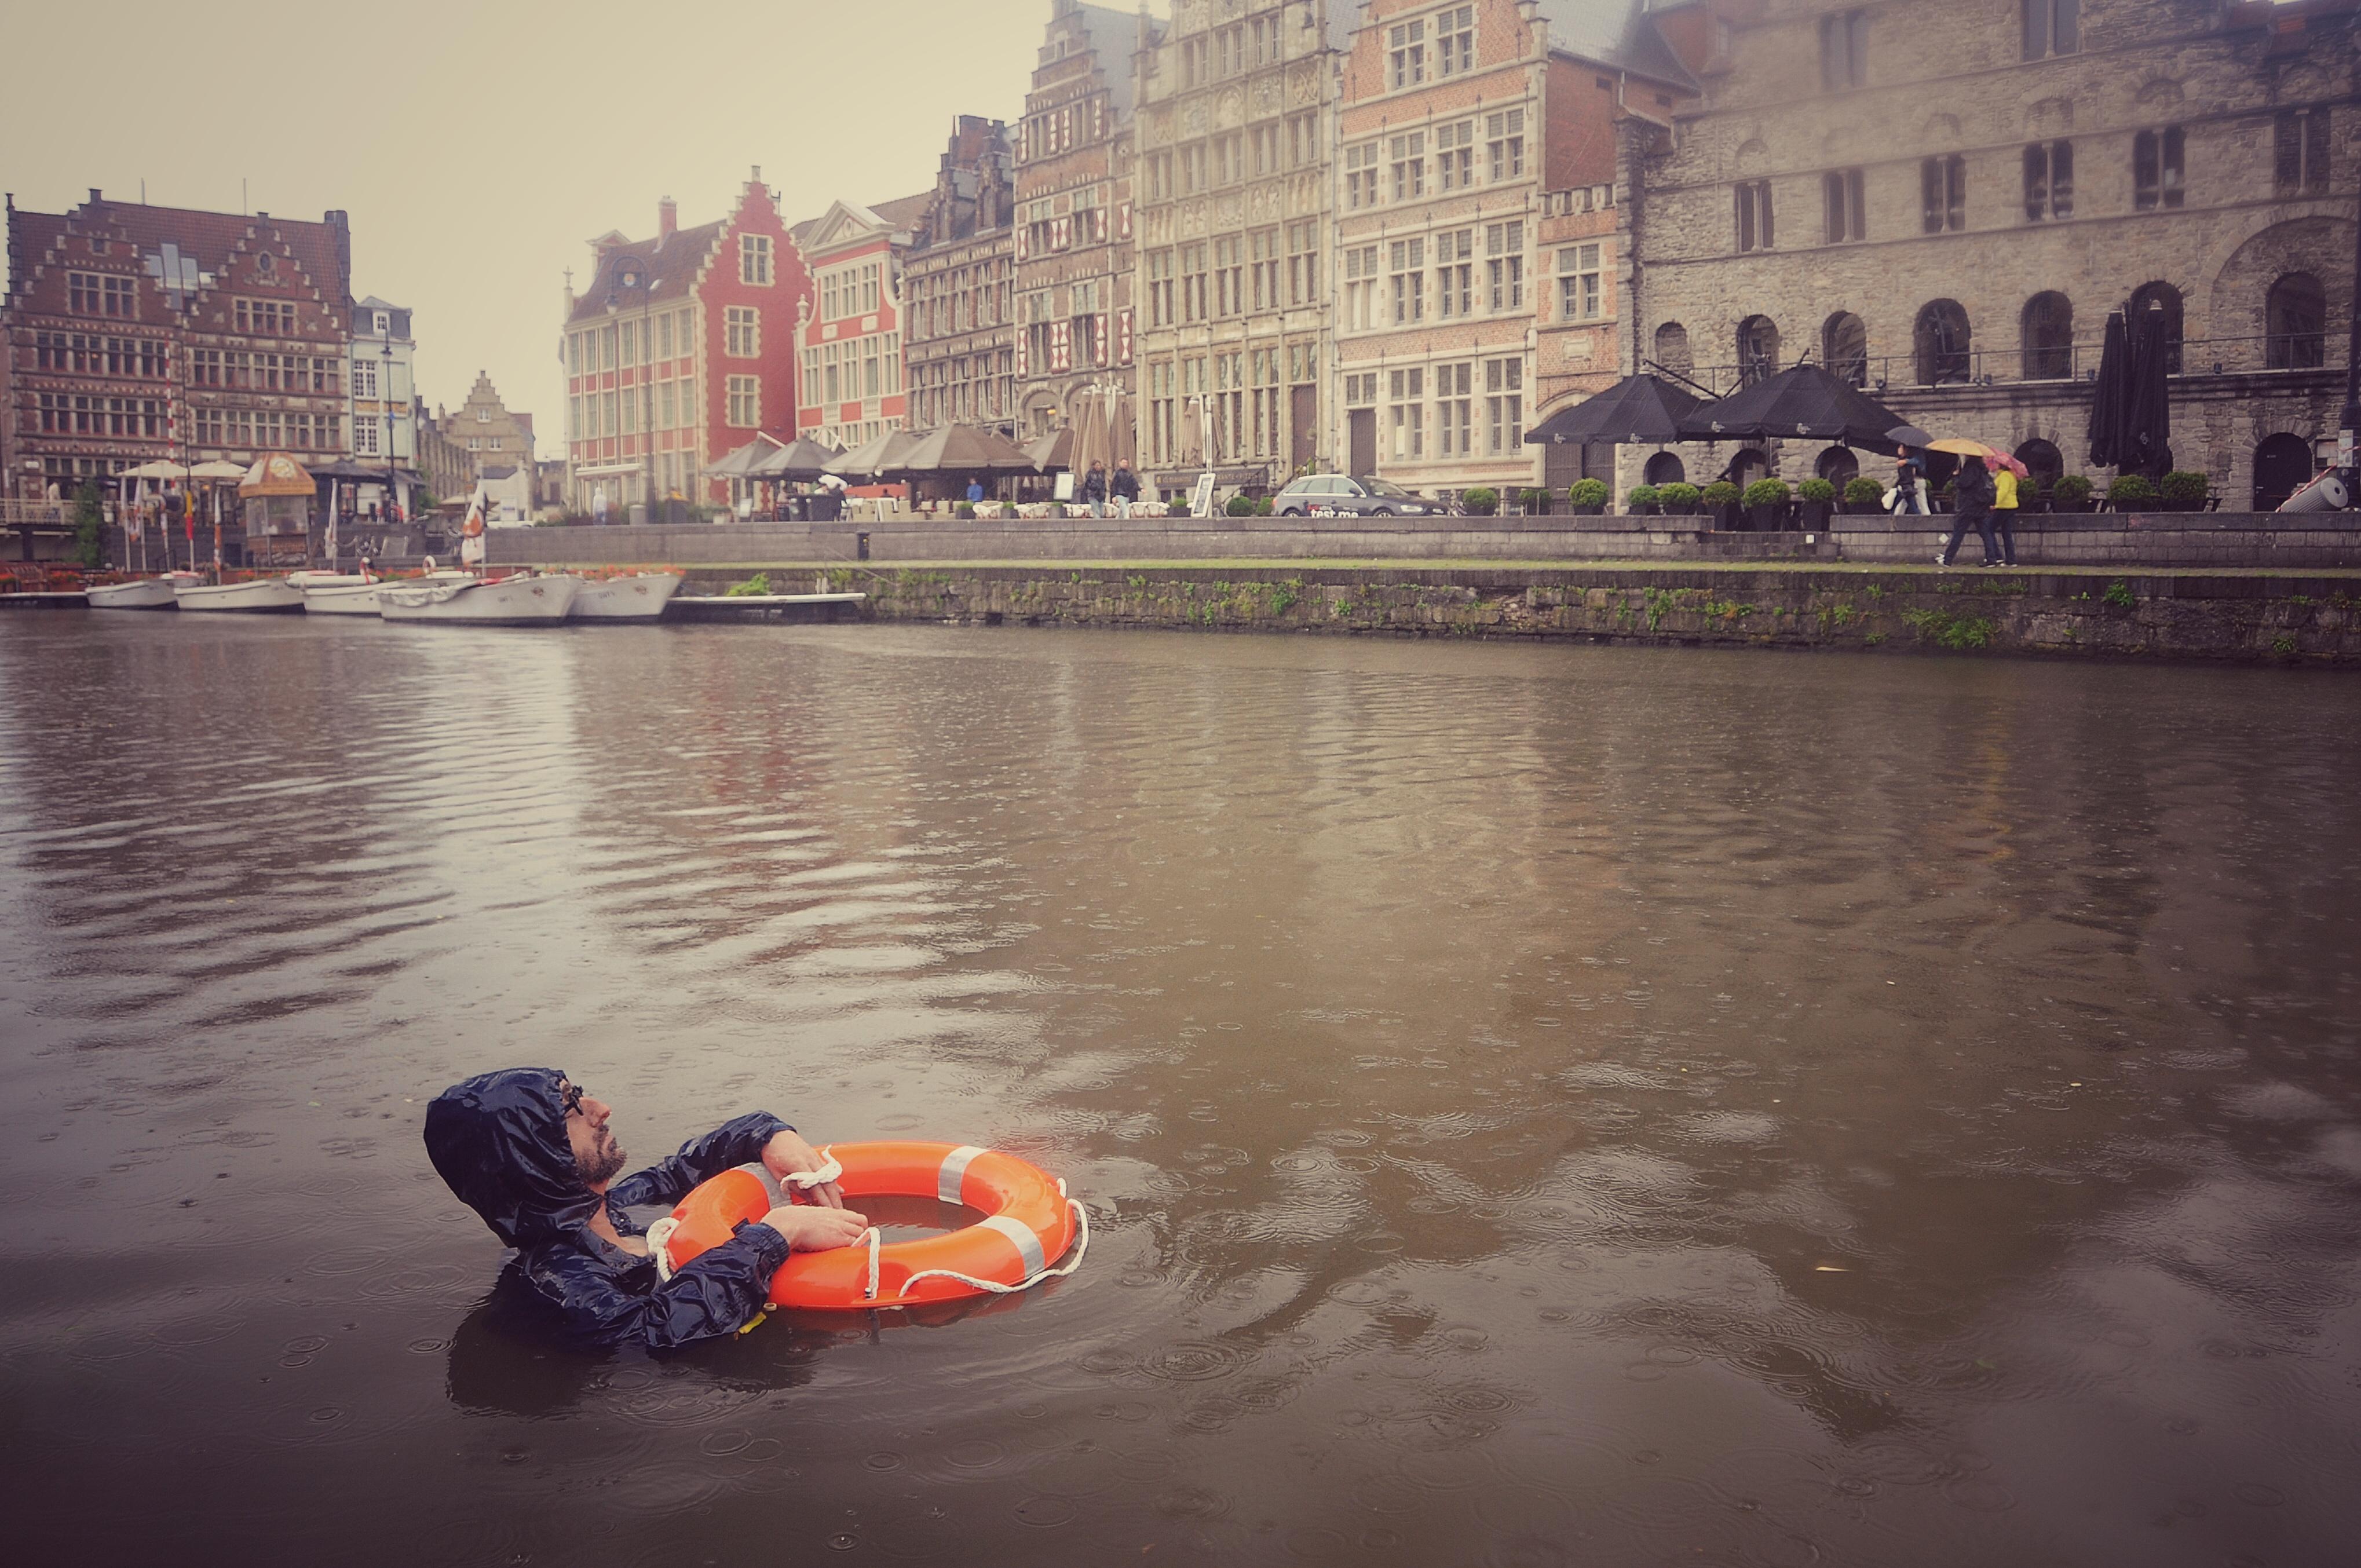 Drowning Wo/Man – Schellekens